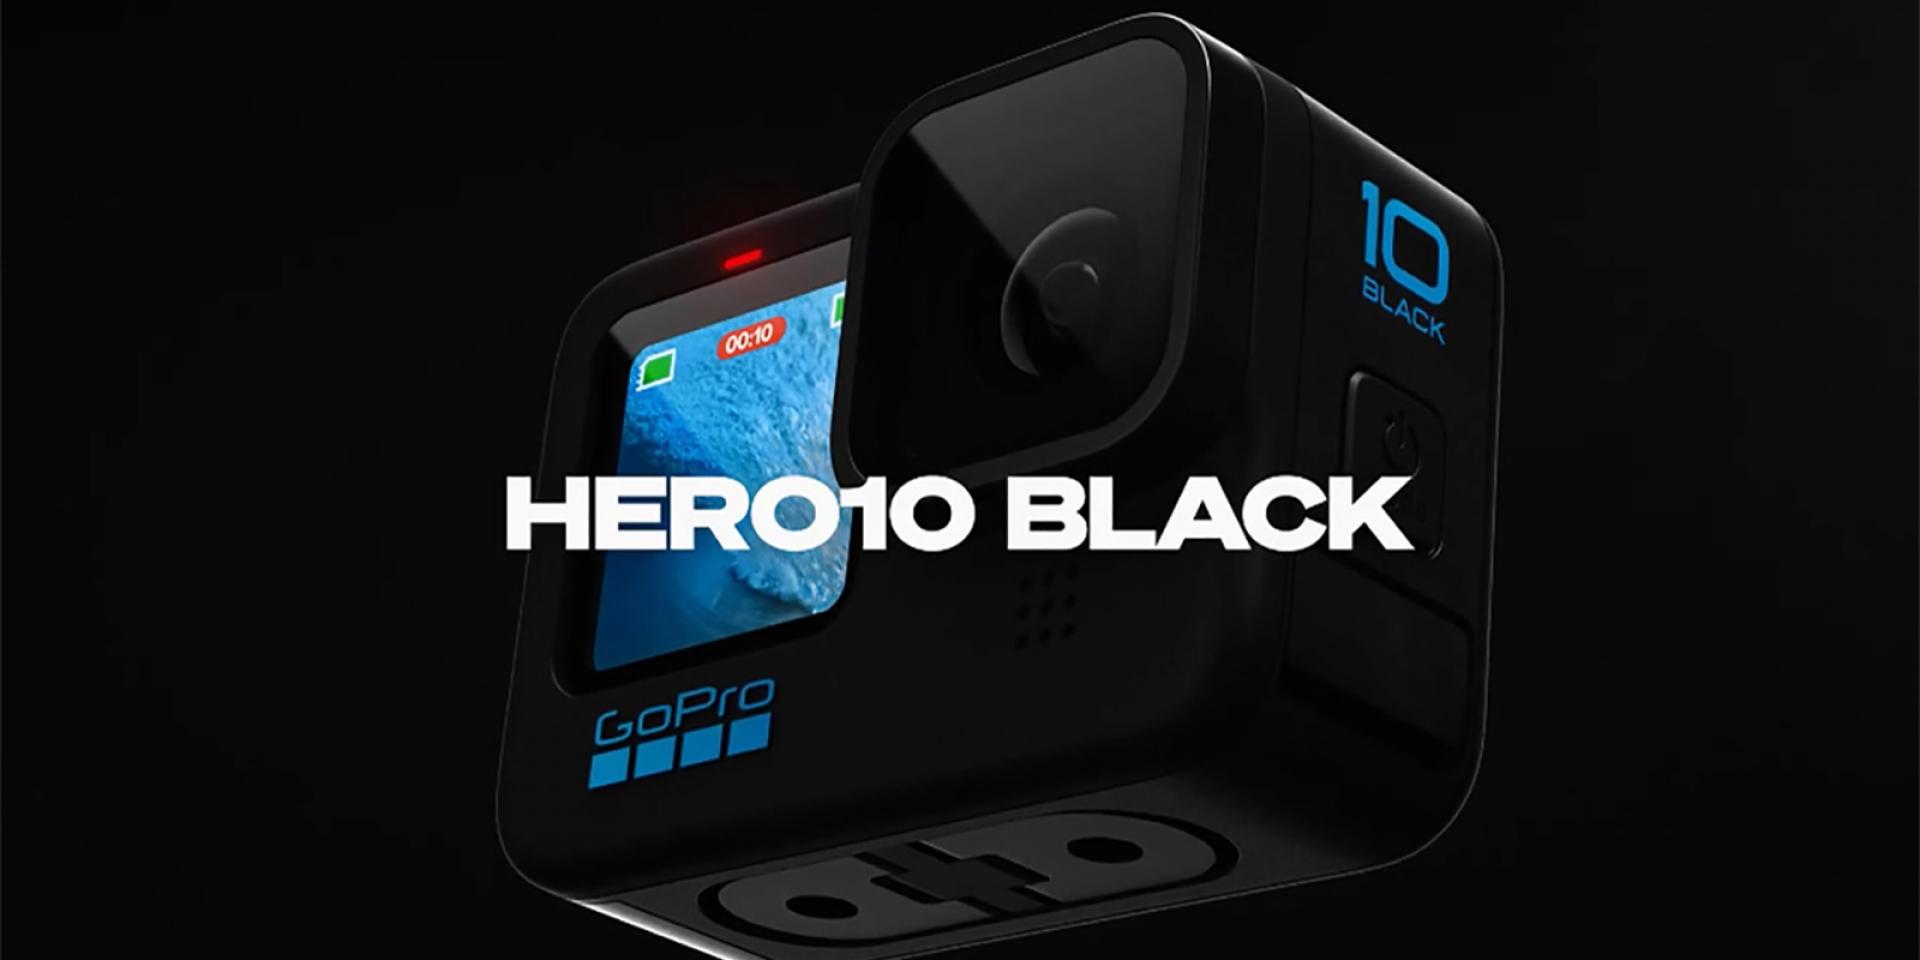 23.6MP CMOS、GP2處理器。GoPro Hero 10 Black 17,000元正式發表!